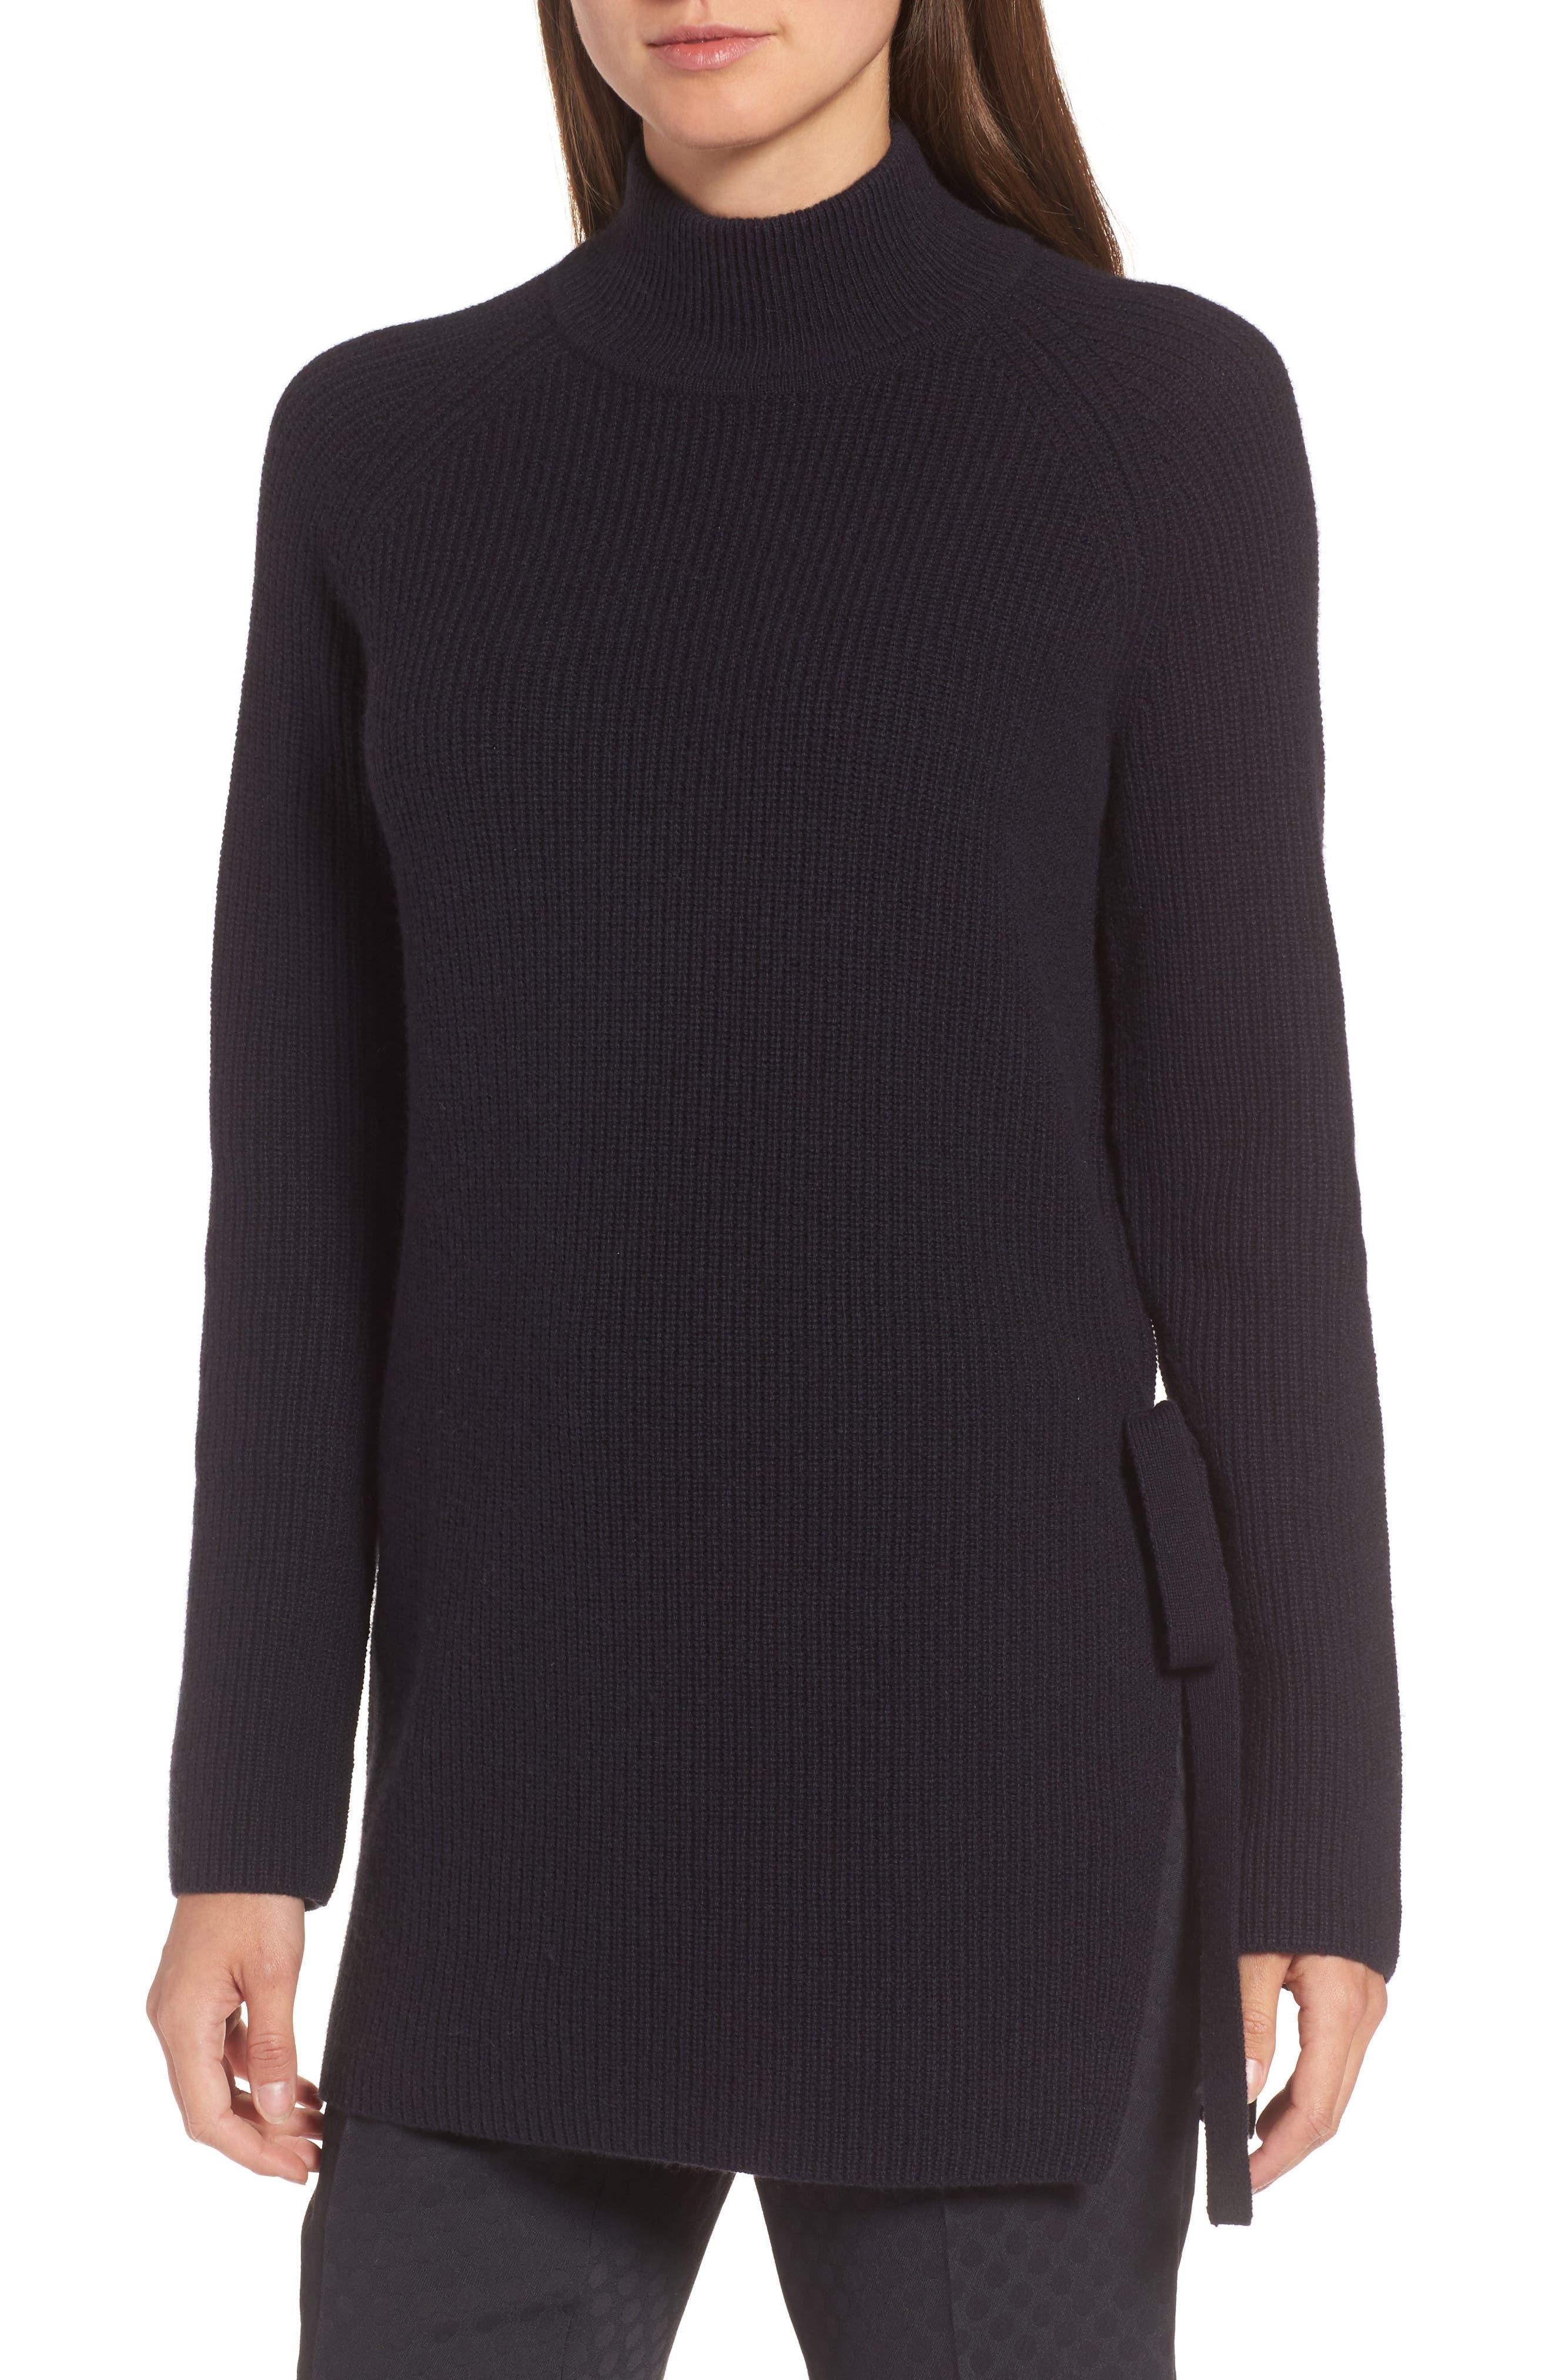 Alternate Image 1 Selected - BOSS Filda Tie Side Wool Blend Sweater